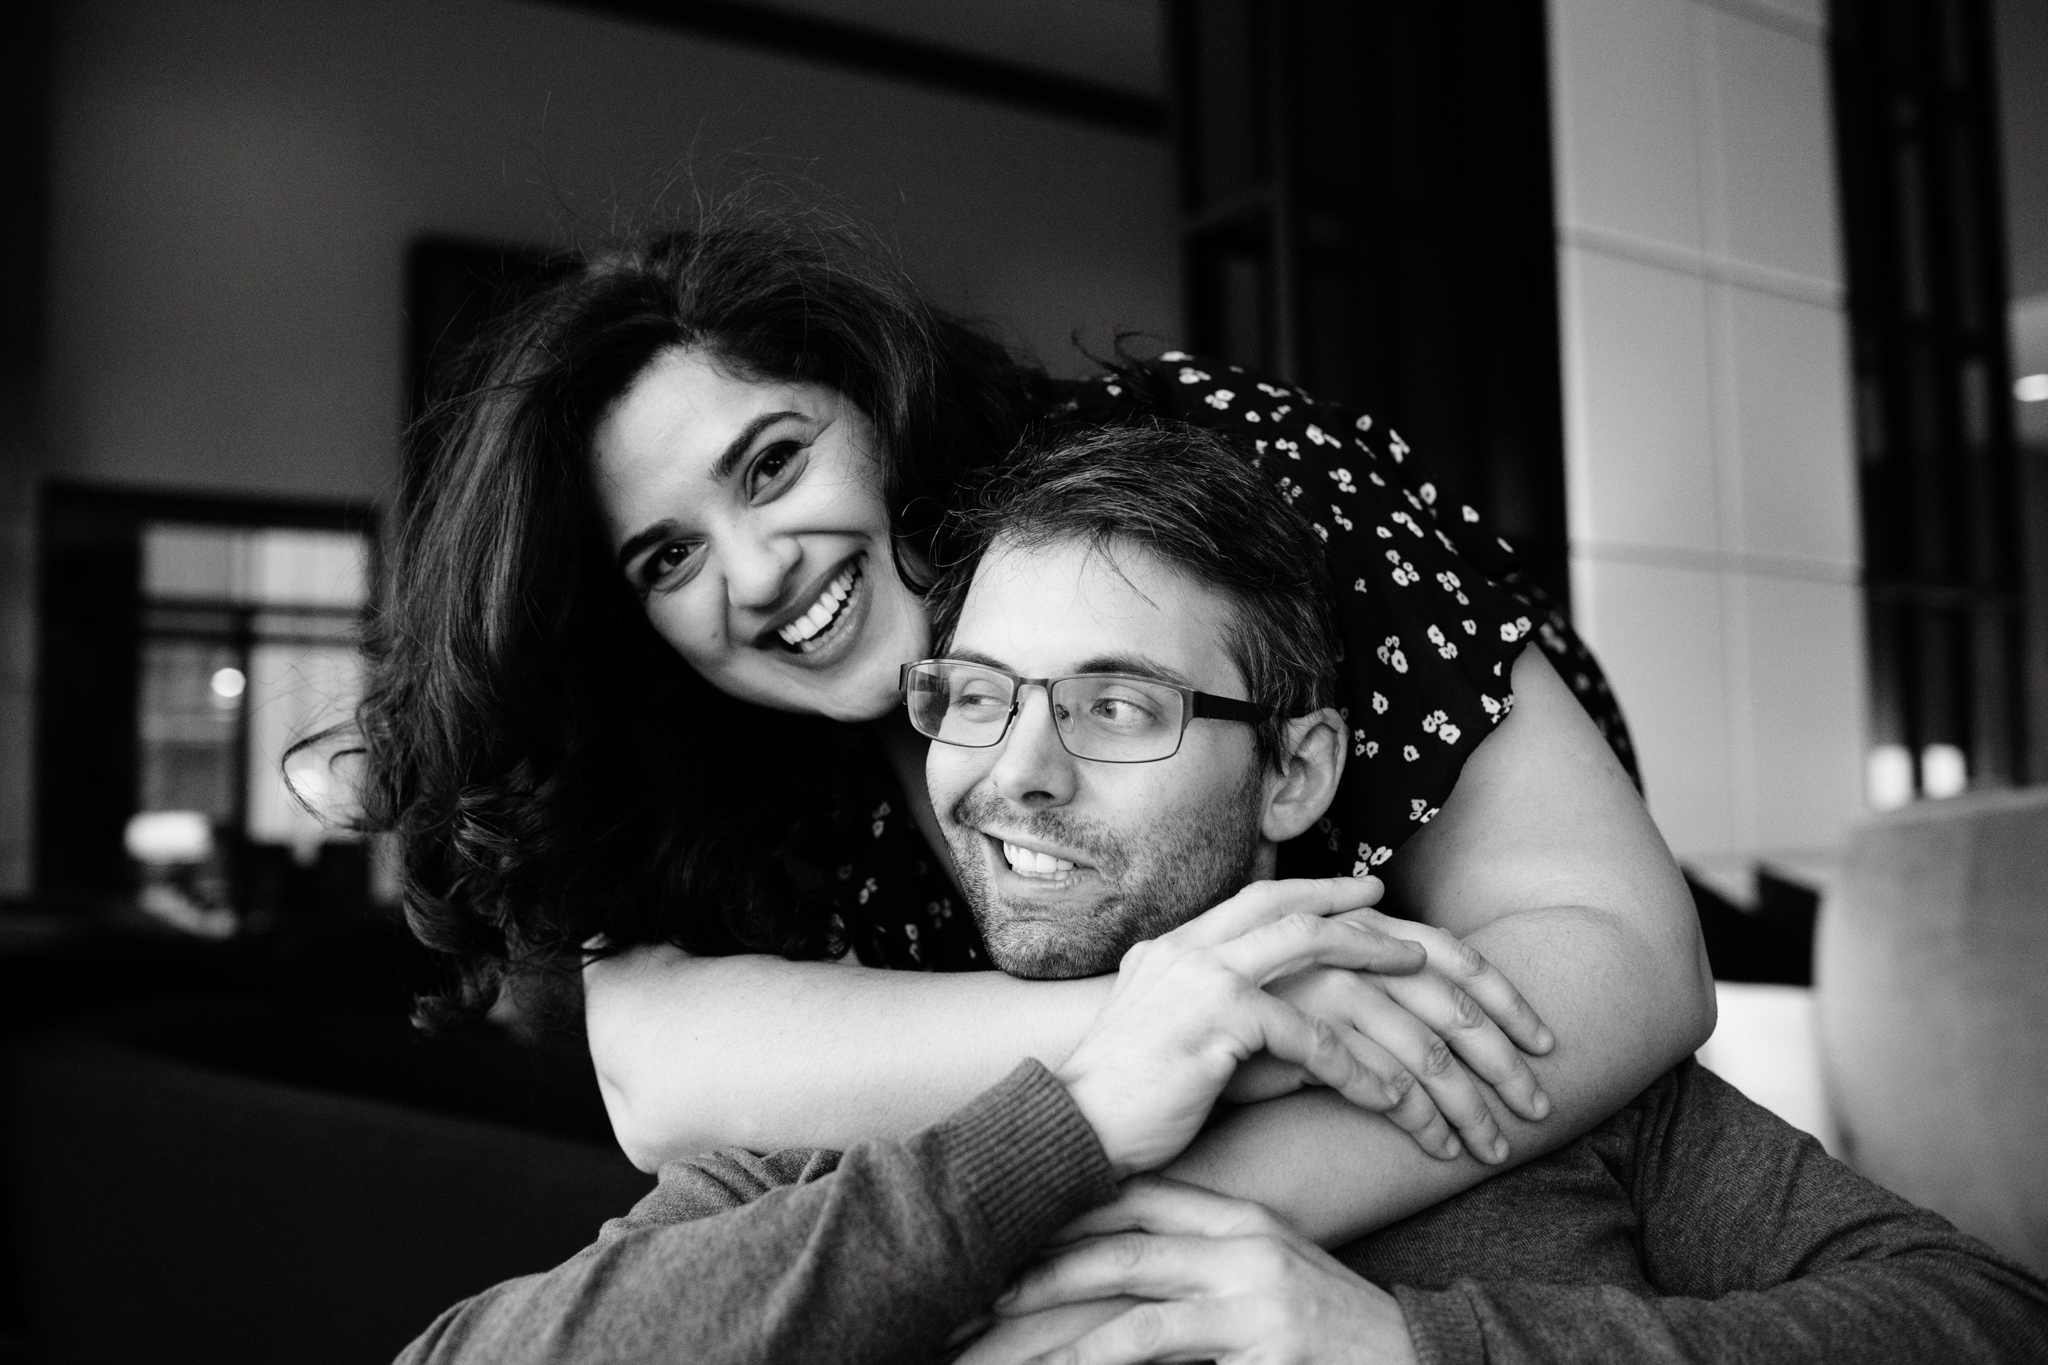 maine-wedding-photographer-engagement-session  -59.jpg